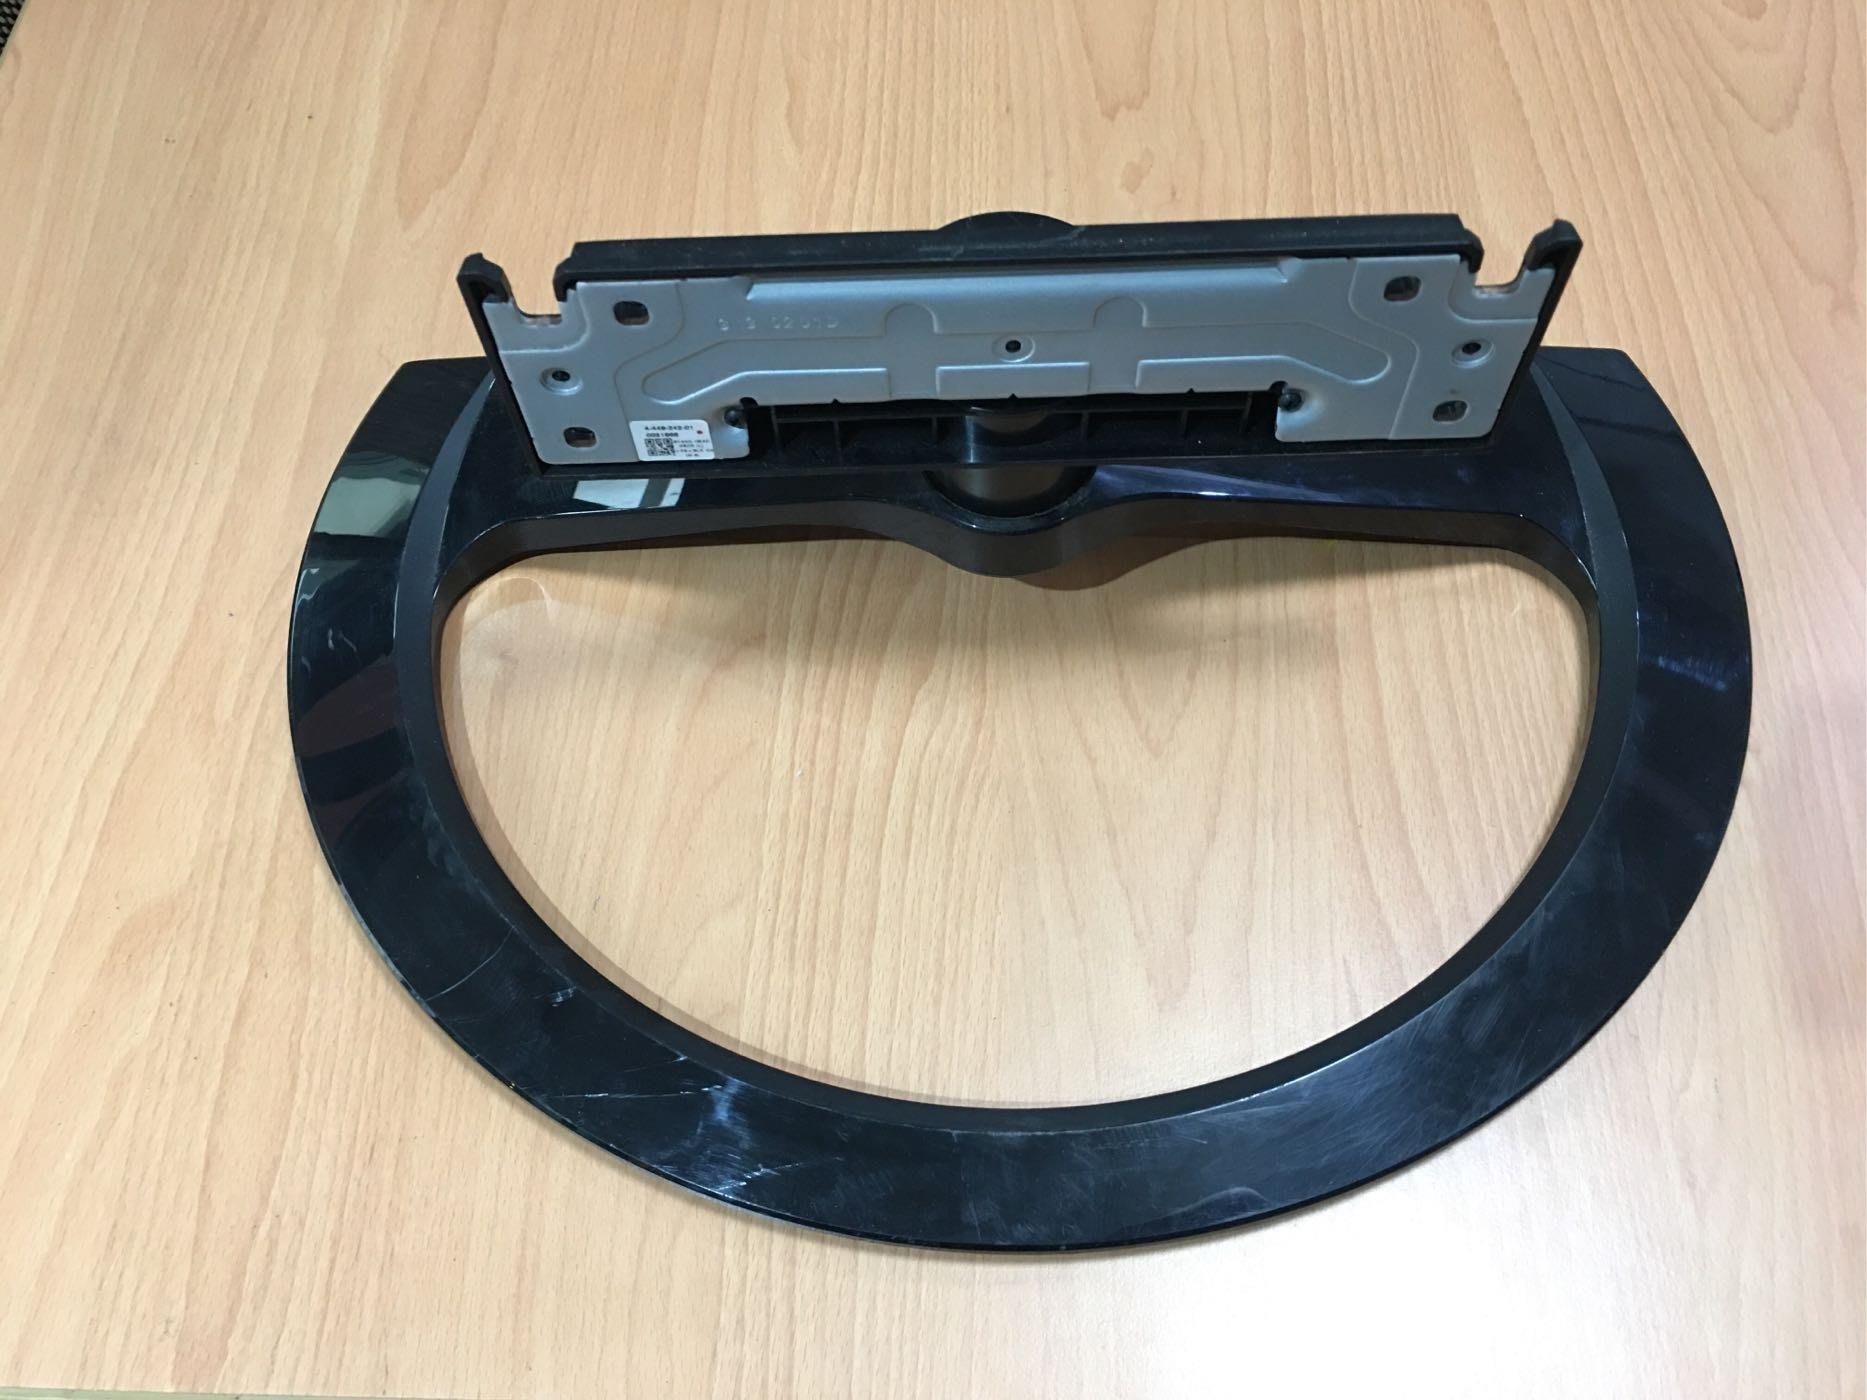 SONY 液晶電視 KDL-50W700A二手電視腳座 50型